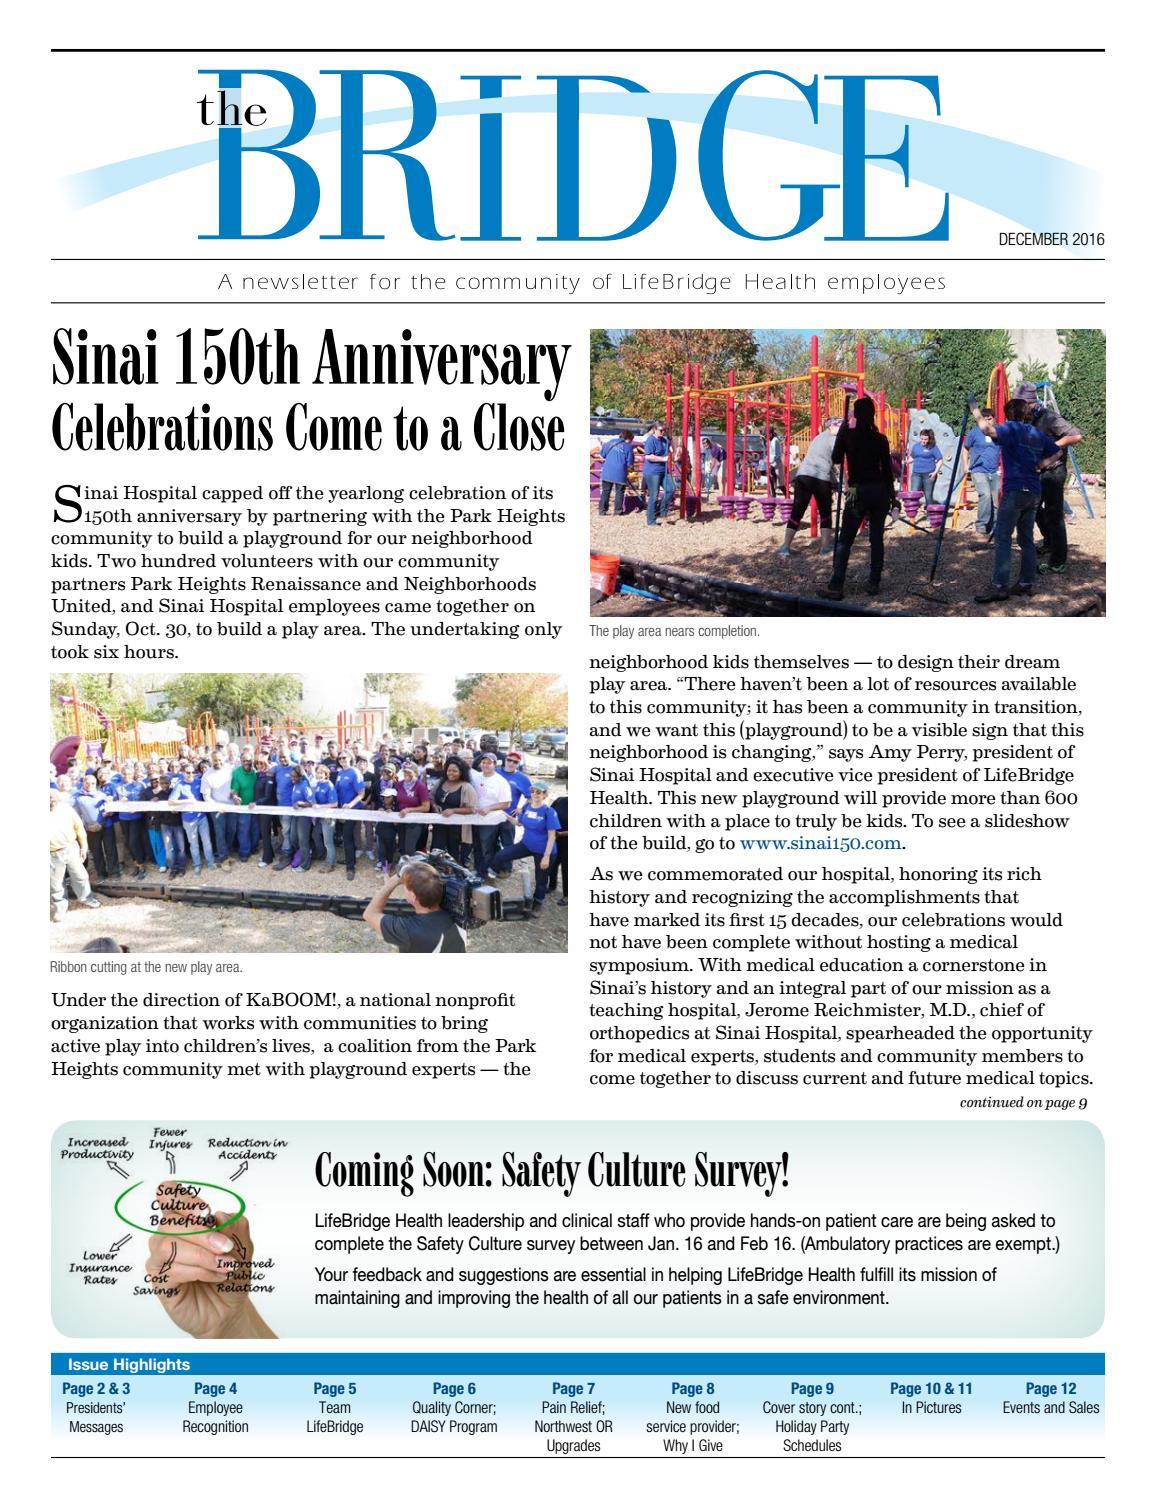 Bridge December 2016 by LifeBridge Health - issuu